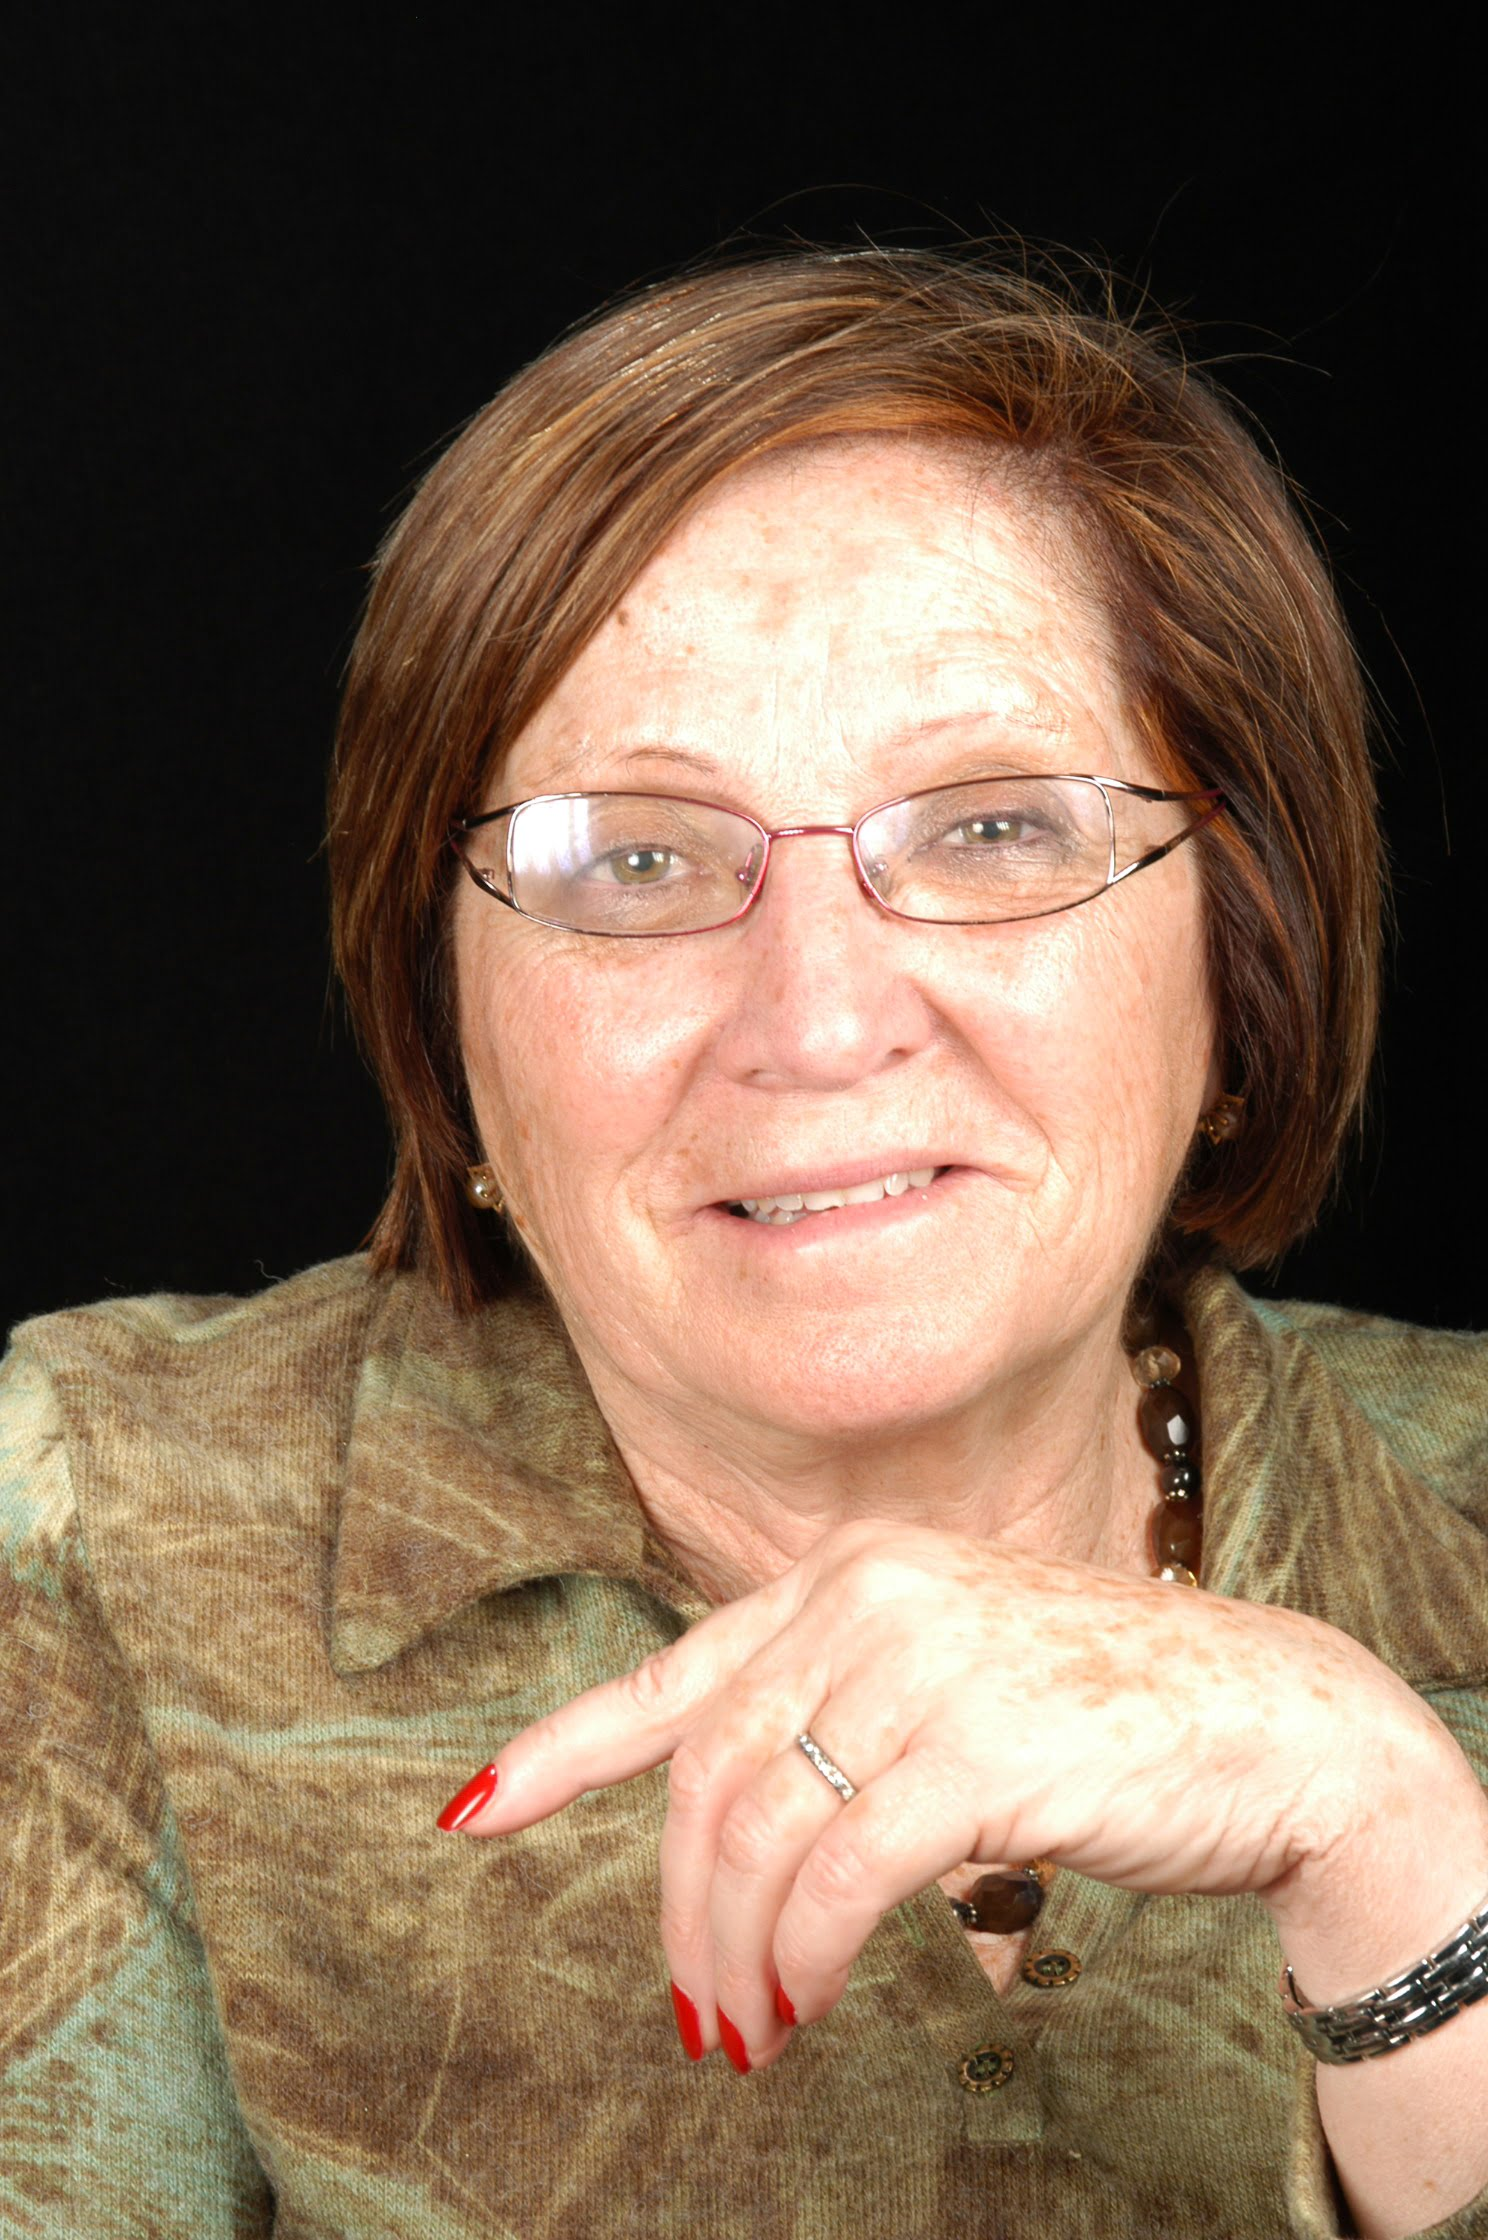 Sra. Montserrat Clavell i Figueras